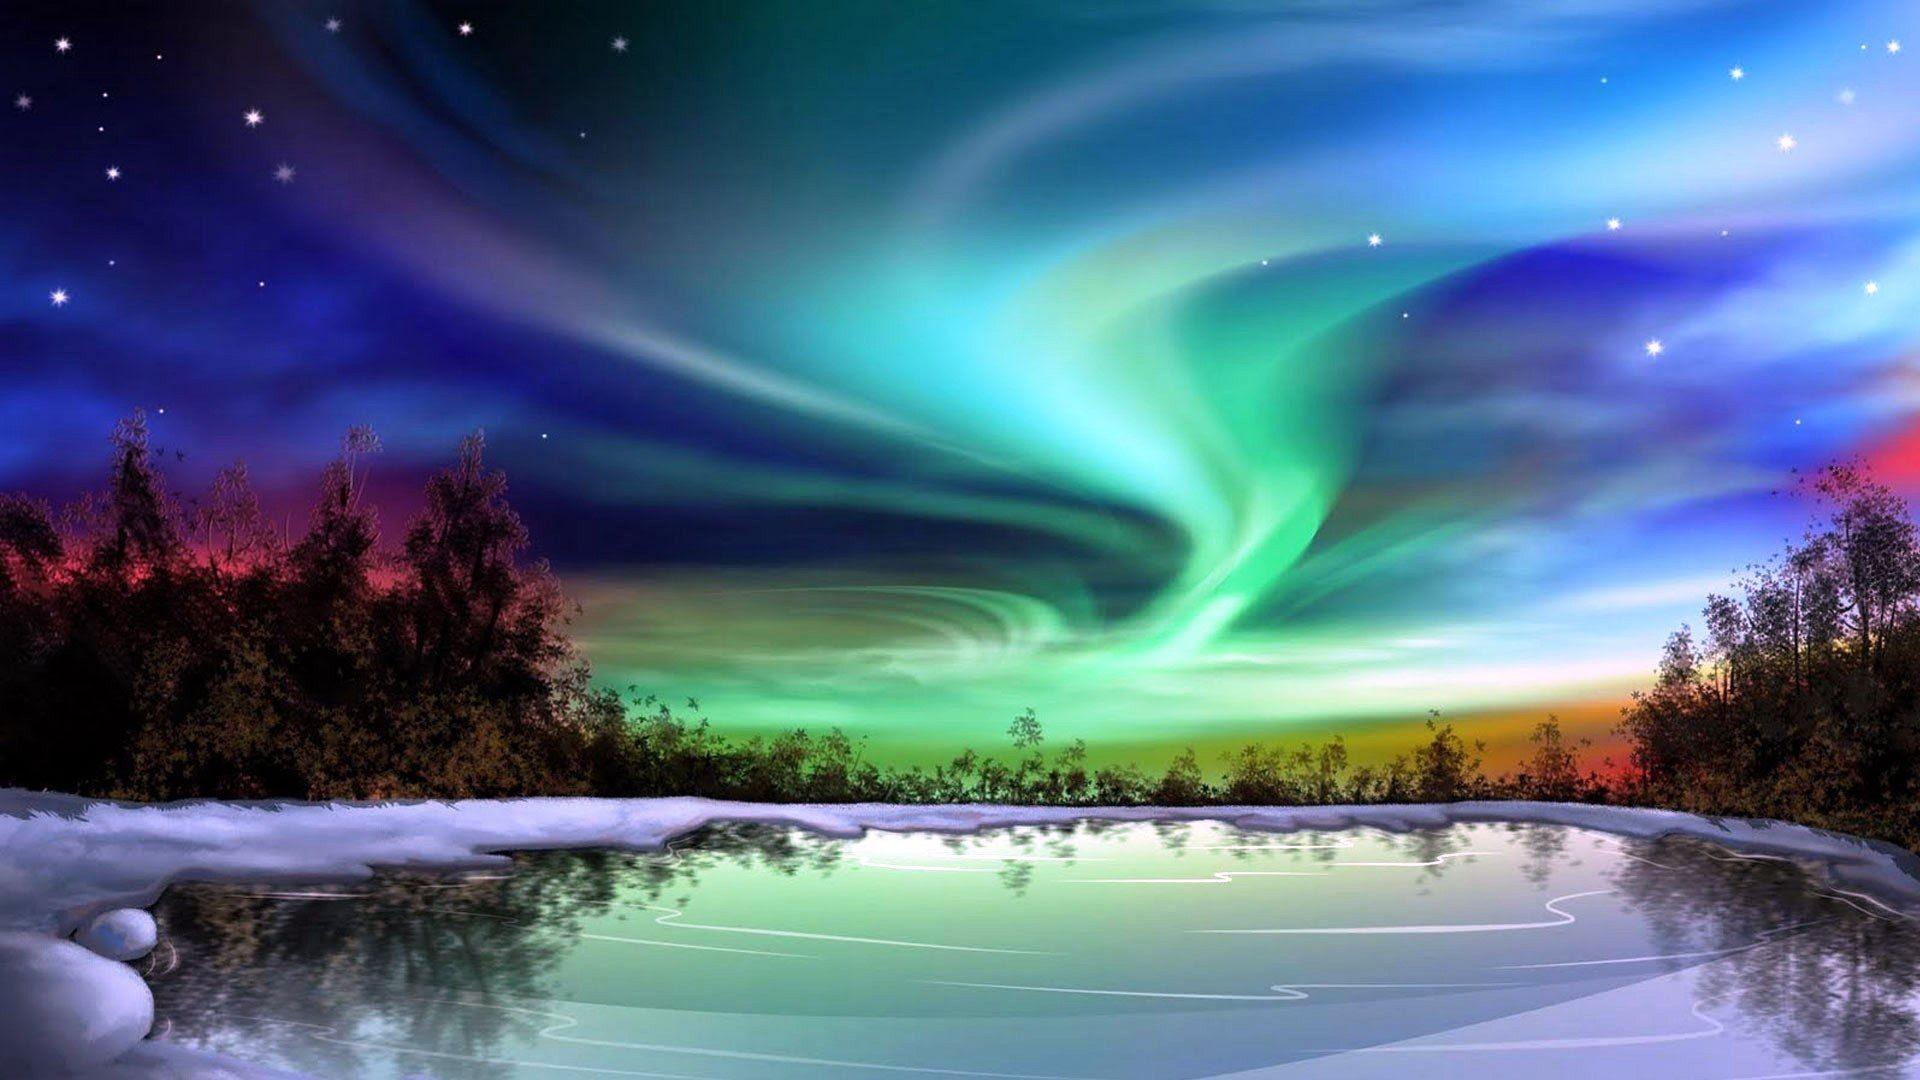 Alaska Night Sky HD Wallpaper (49+ images)